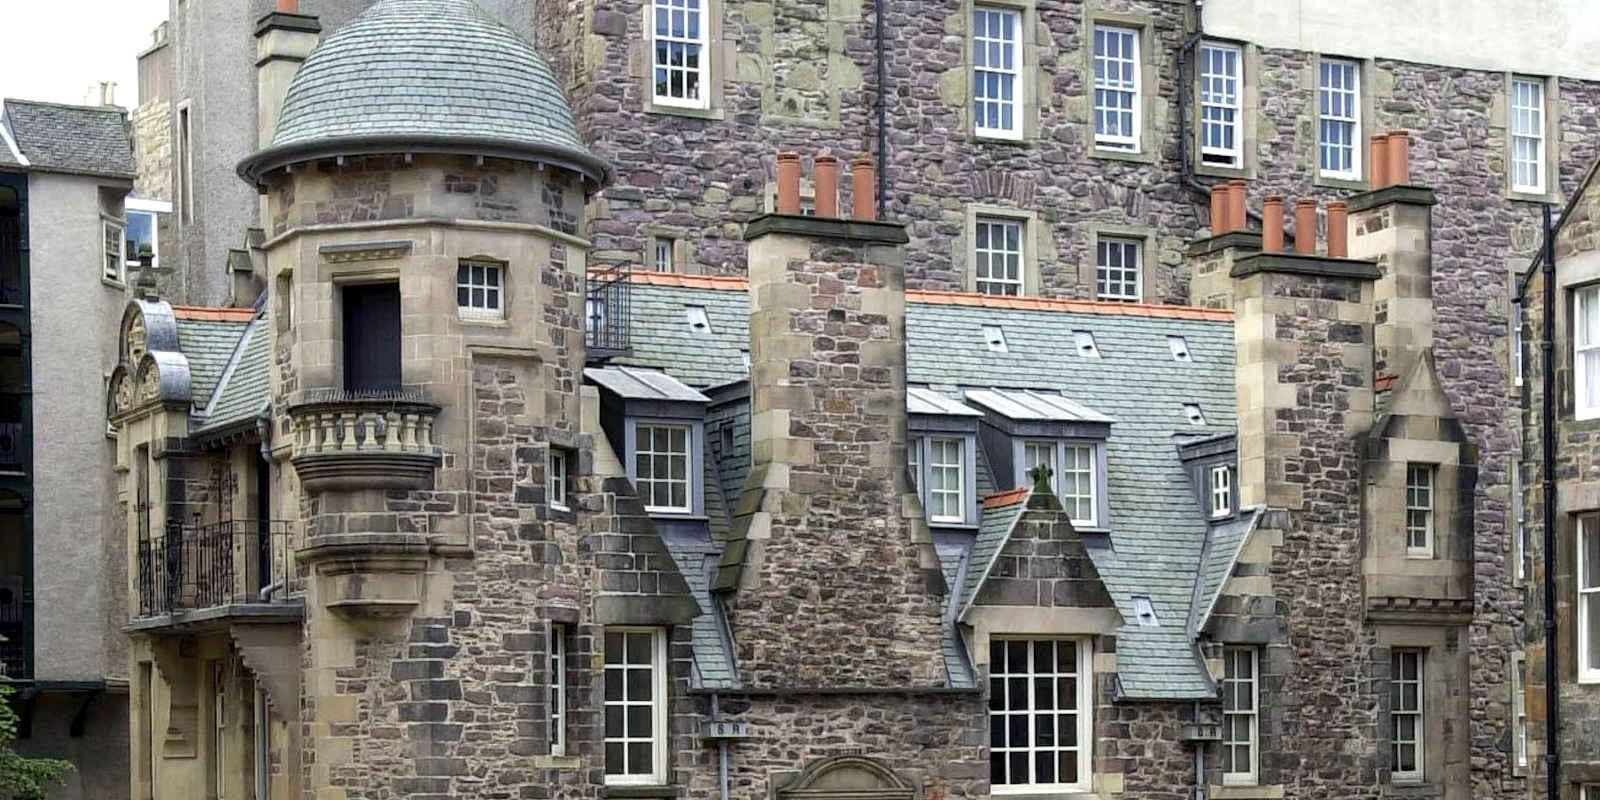 Rooftops and chimneys of Writers Museum in Edinburgh